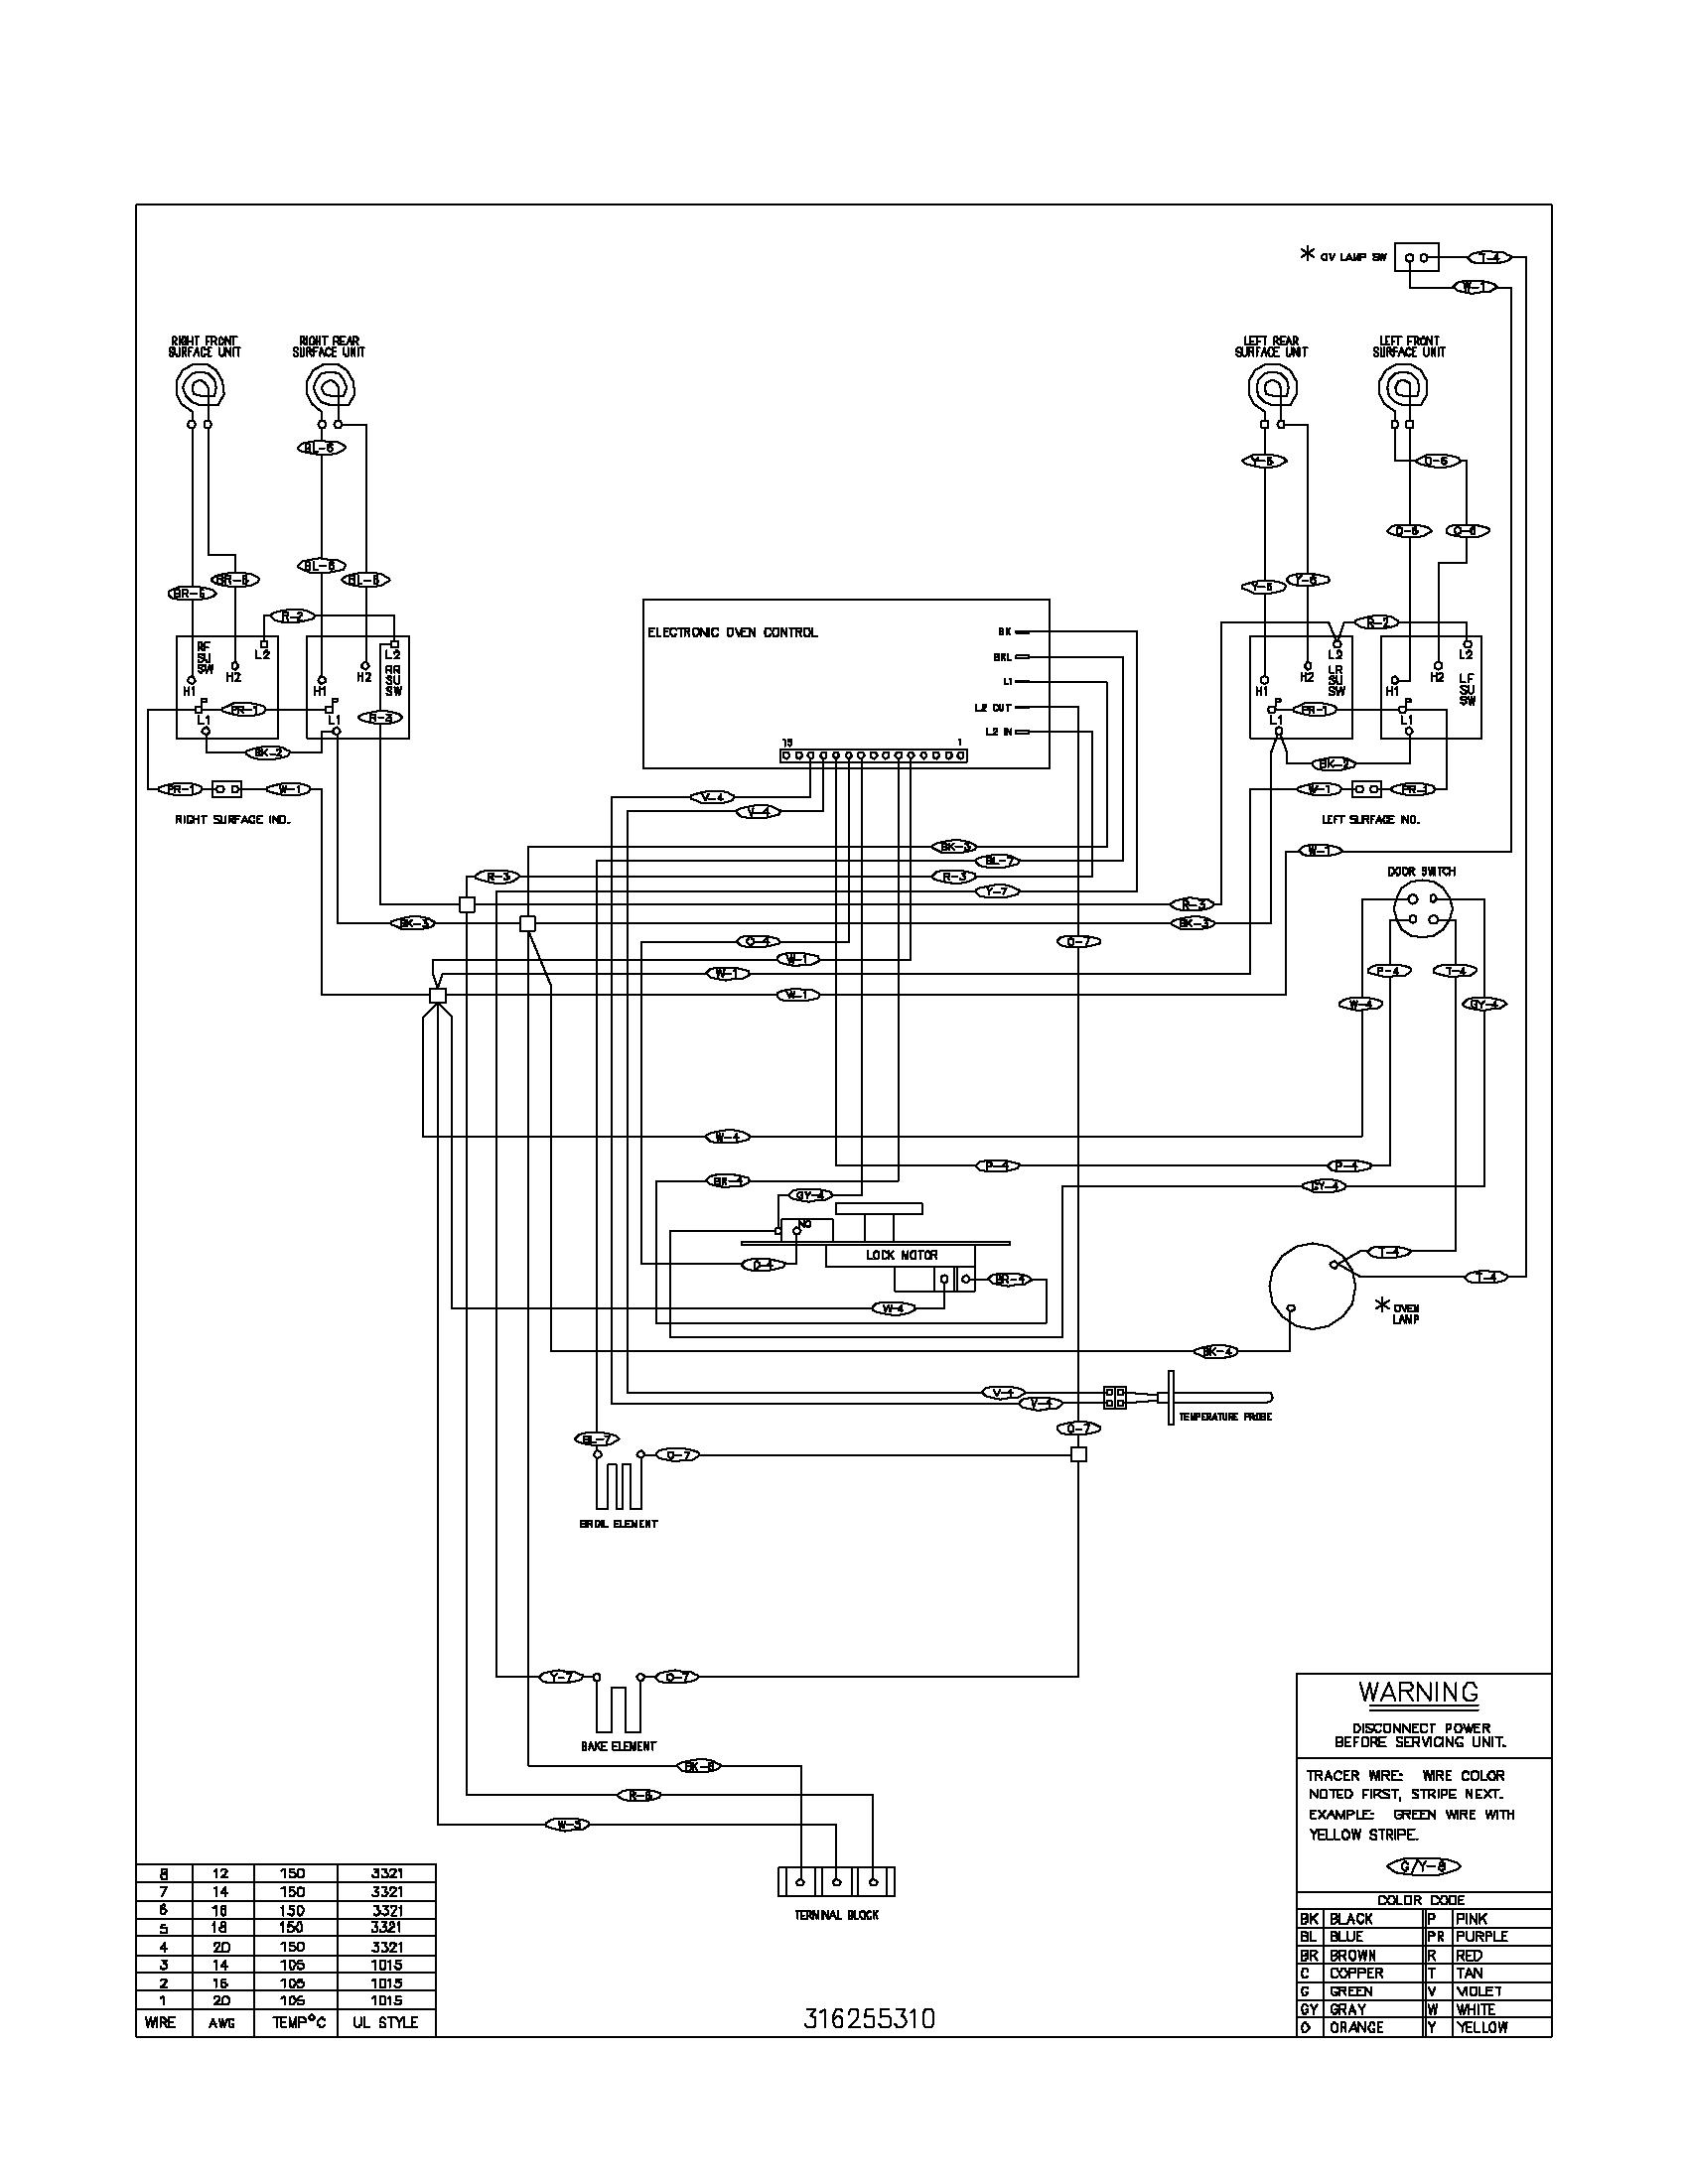 Infinite Switch Wiring Diagram | Wiring Diagram - Infinite Switch Wiring Diagram